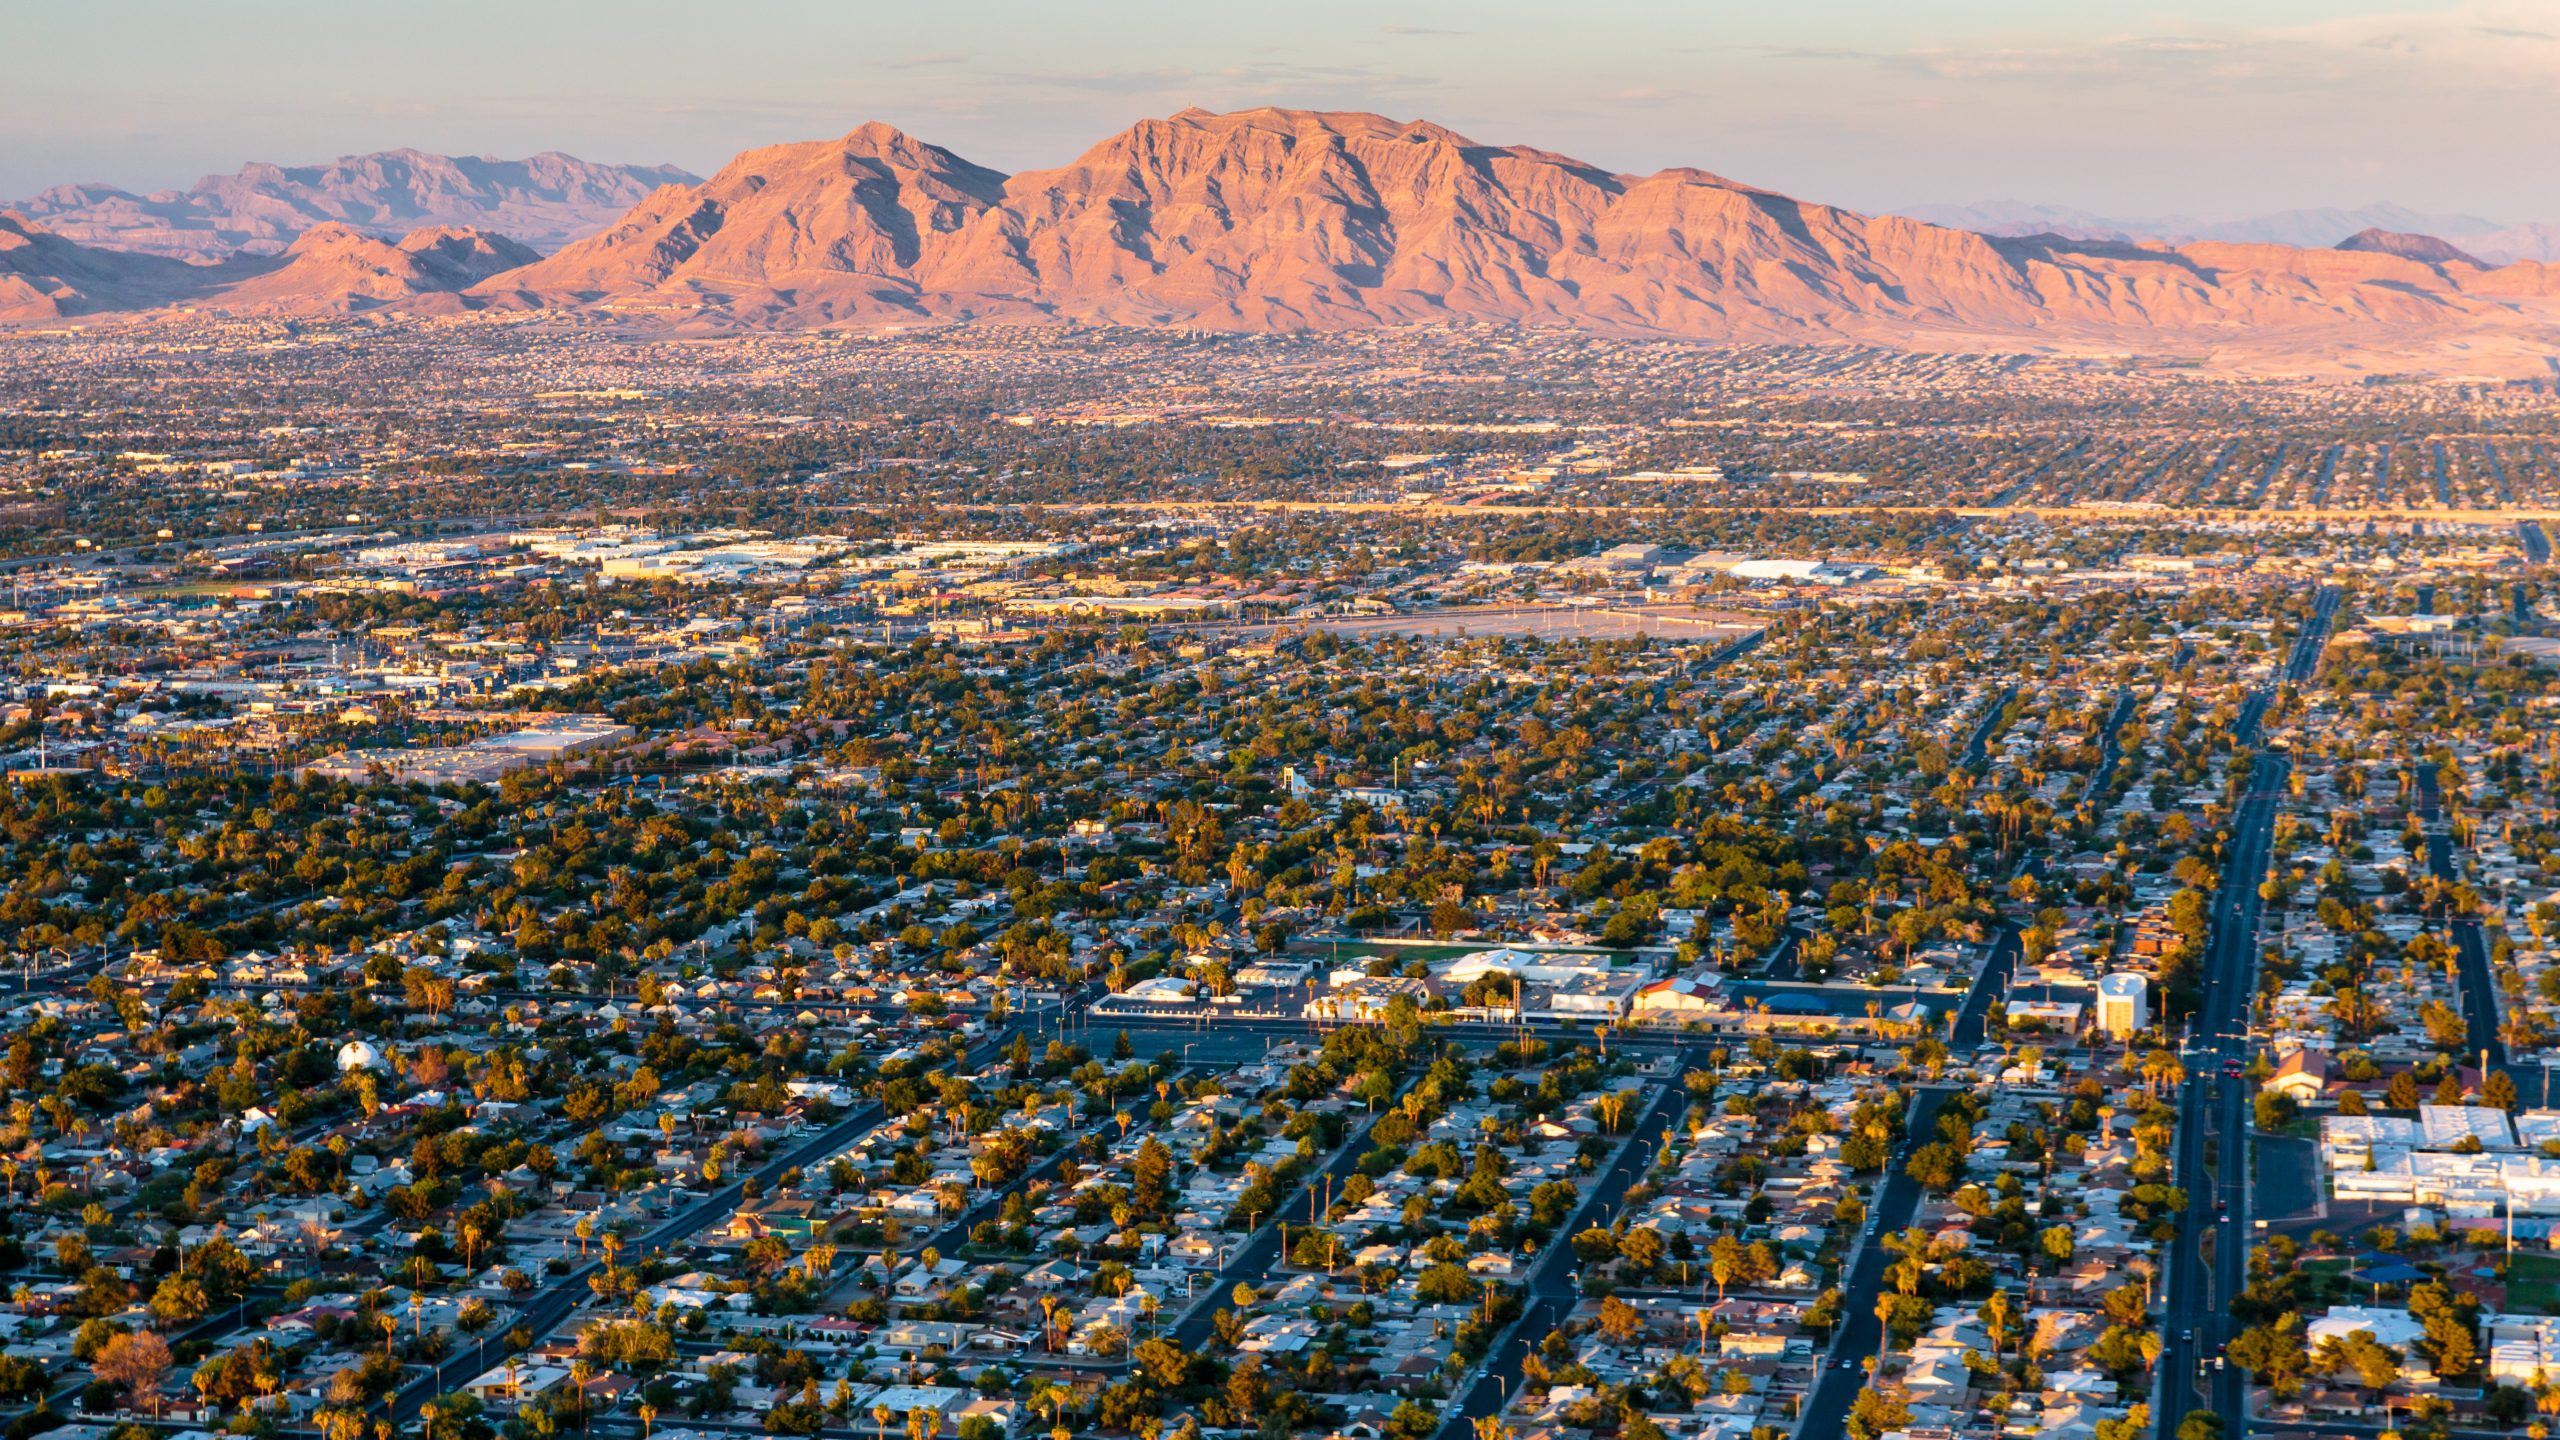 Sunrise Mountain Las Vegas